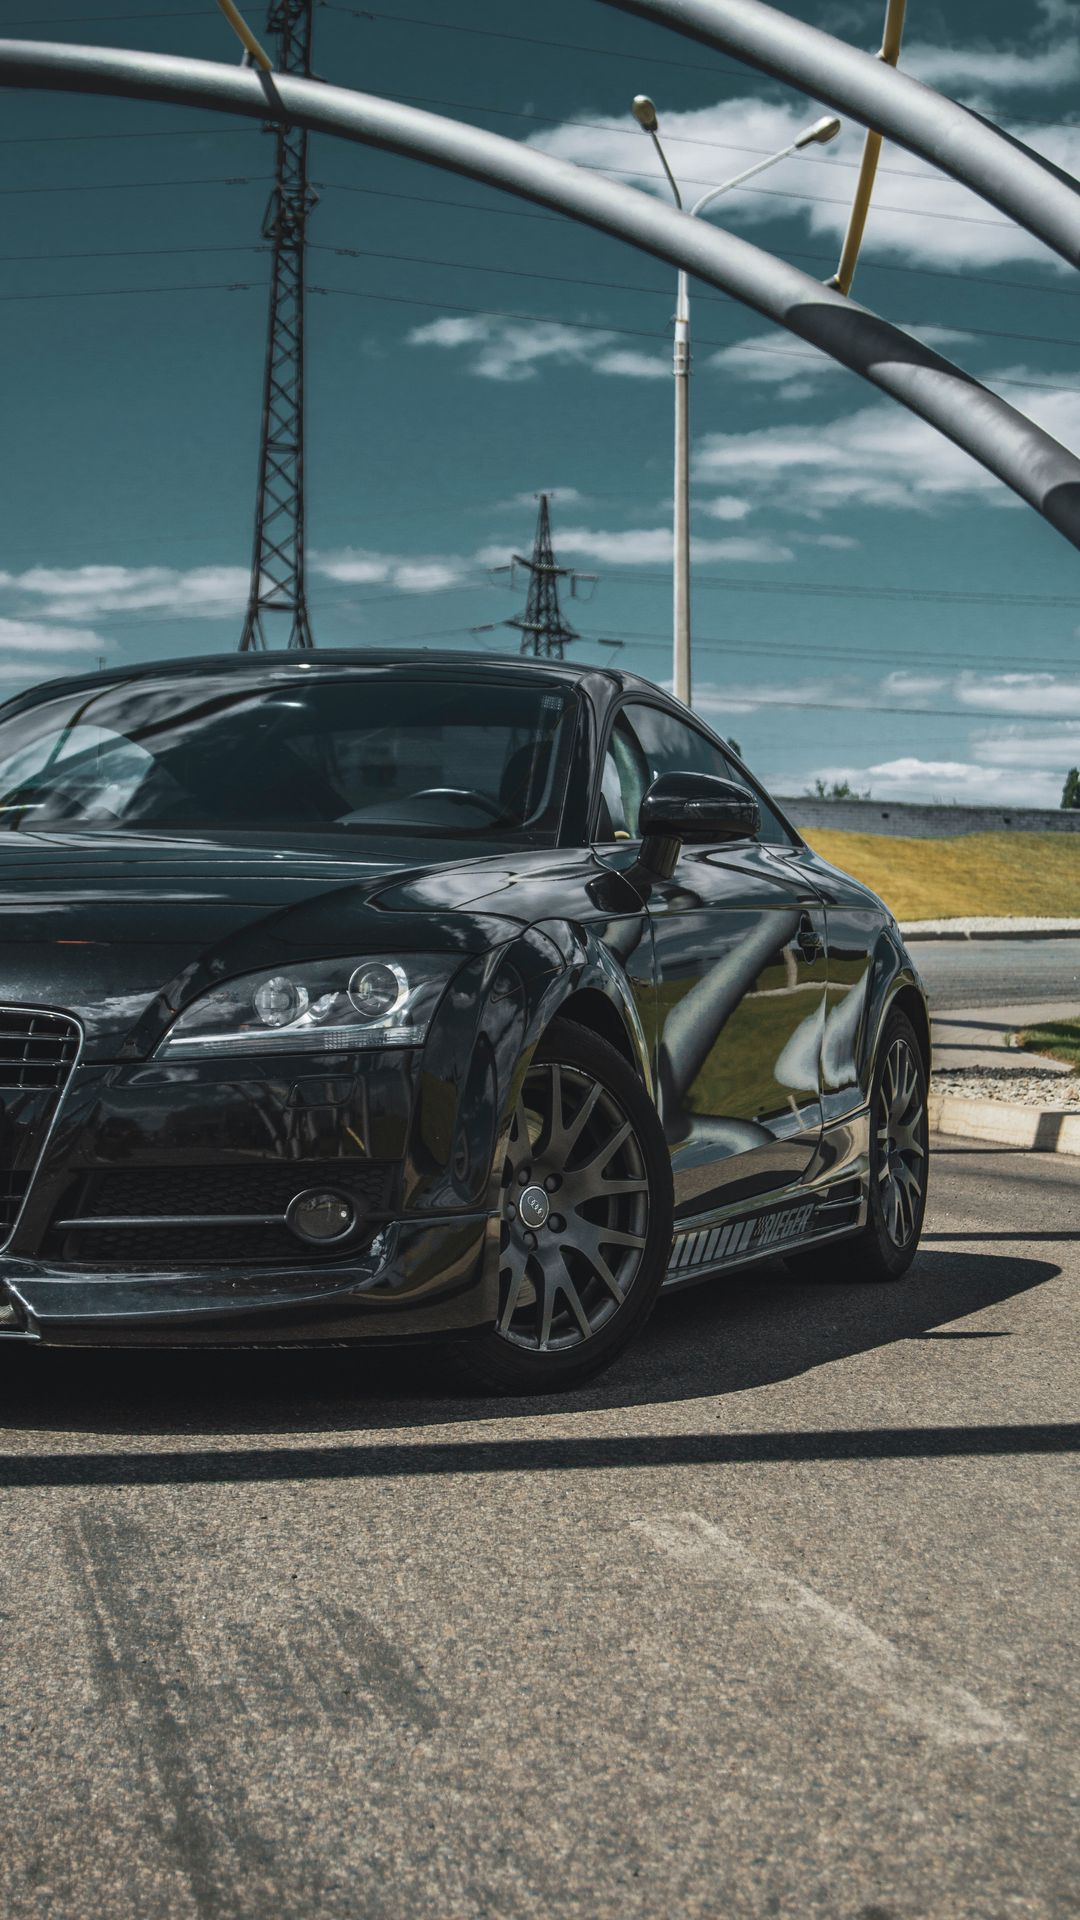 Audi Tunning Car Wallpapers Free Download